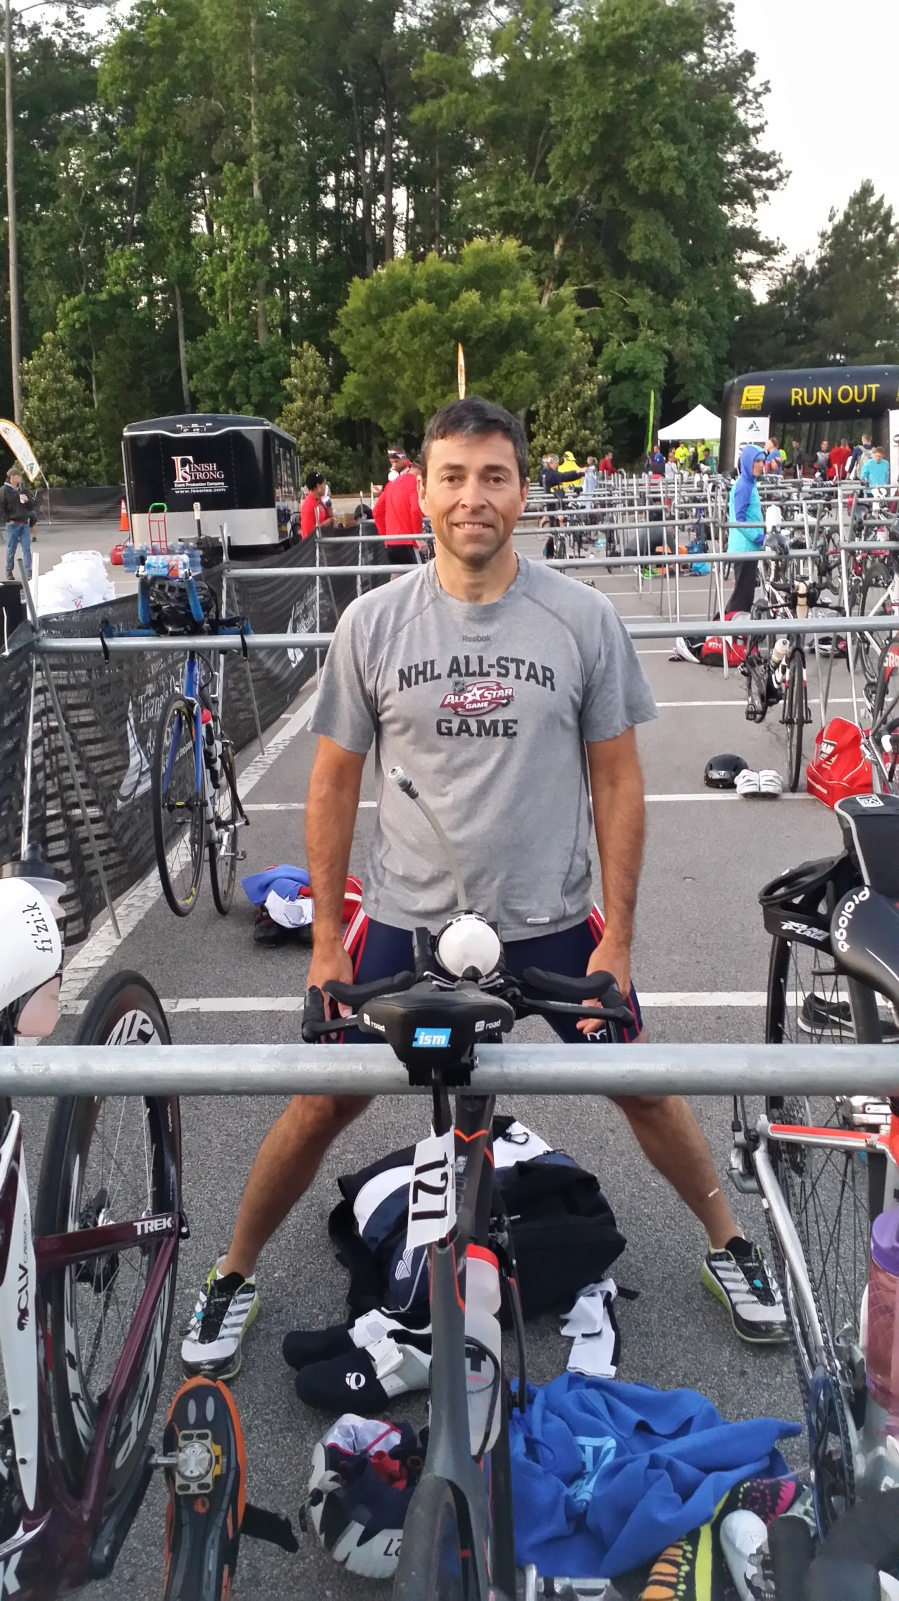 Jeff Gaura, preparing for the Duathlon Long Distance National Championship.